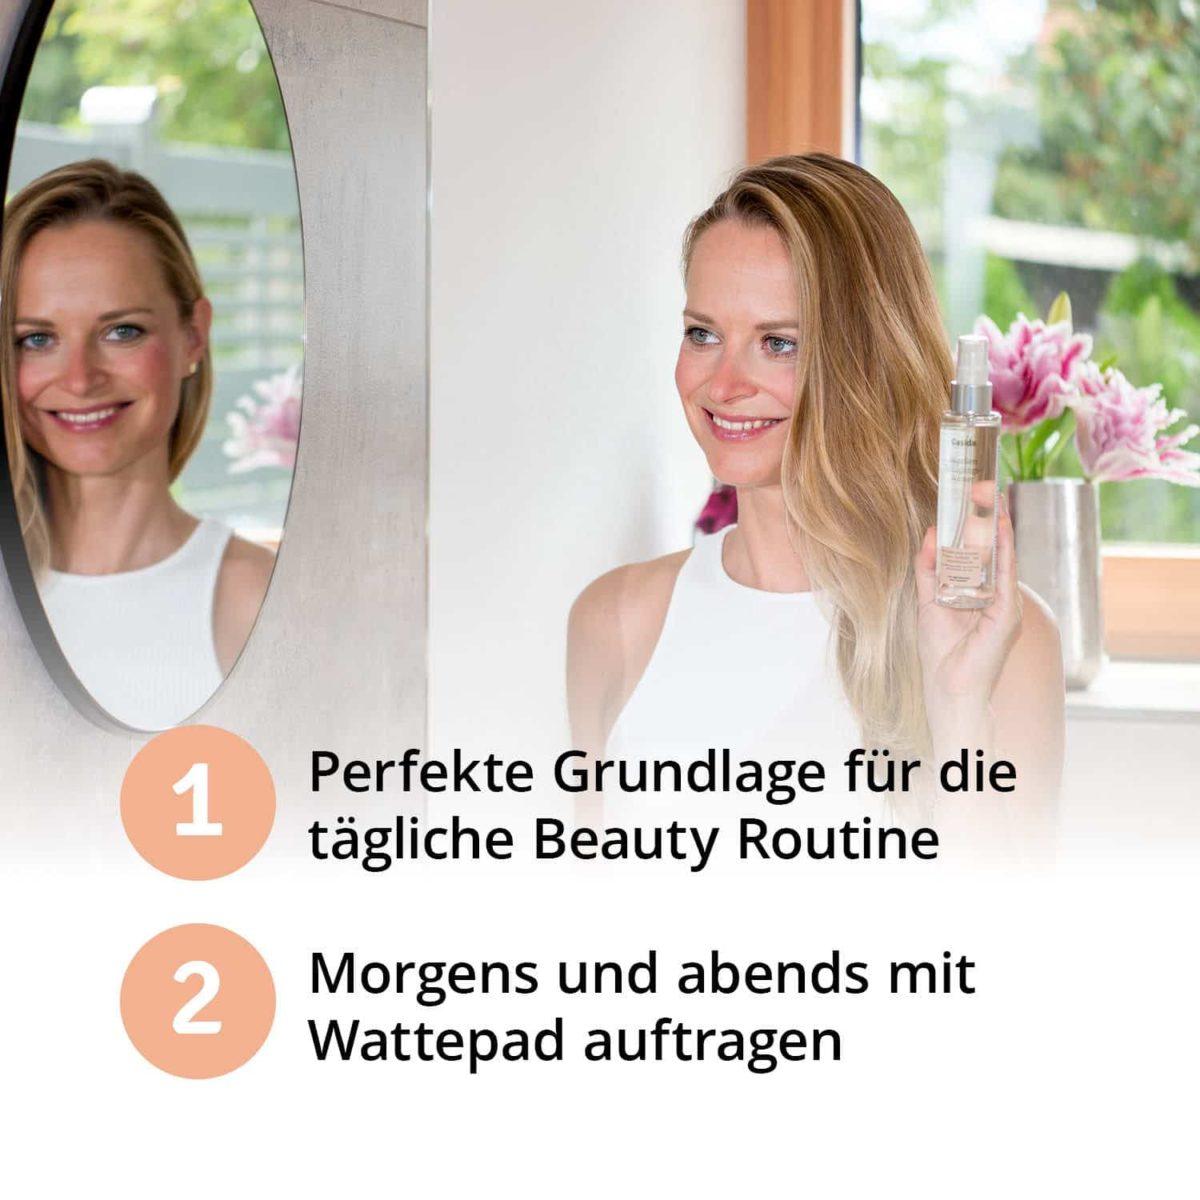 Casida Mizellenwasser Kamille Natural – 150 ml 15408238 PZN Apotheke Abschminken Make-up pflanzlich6